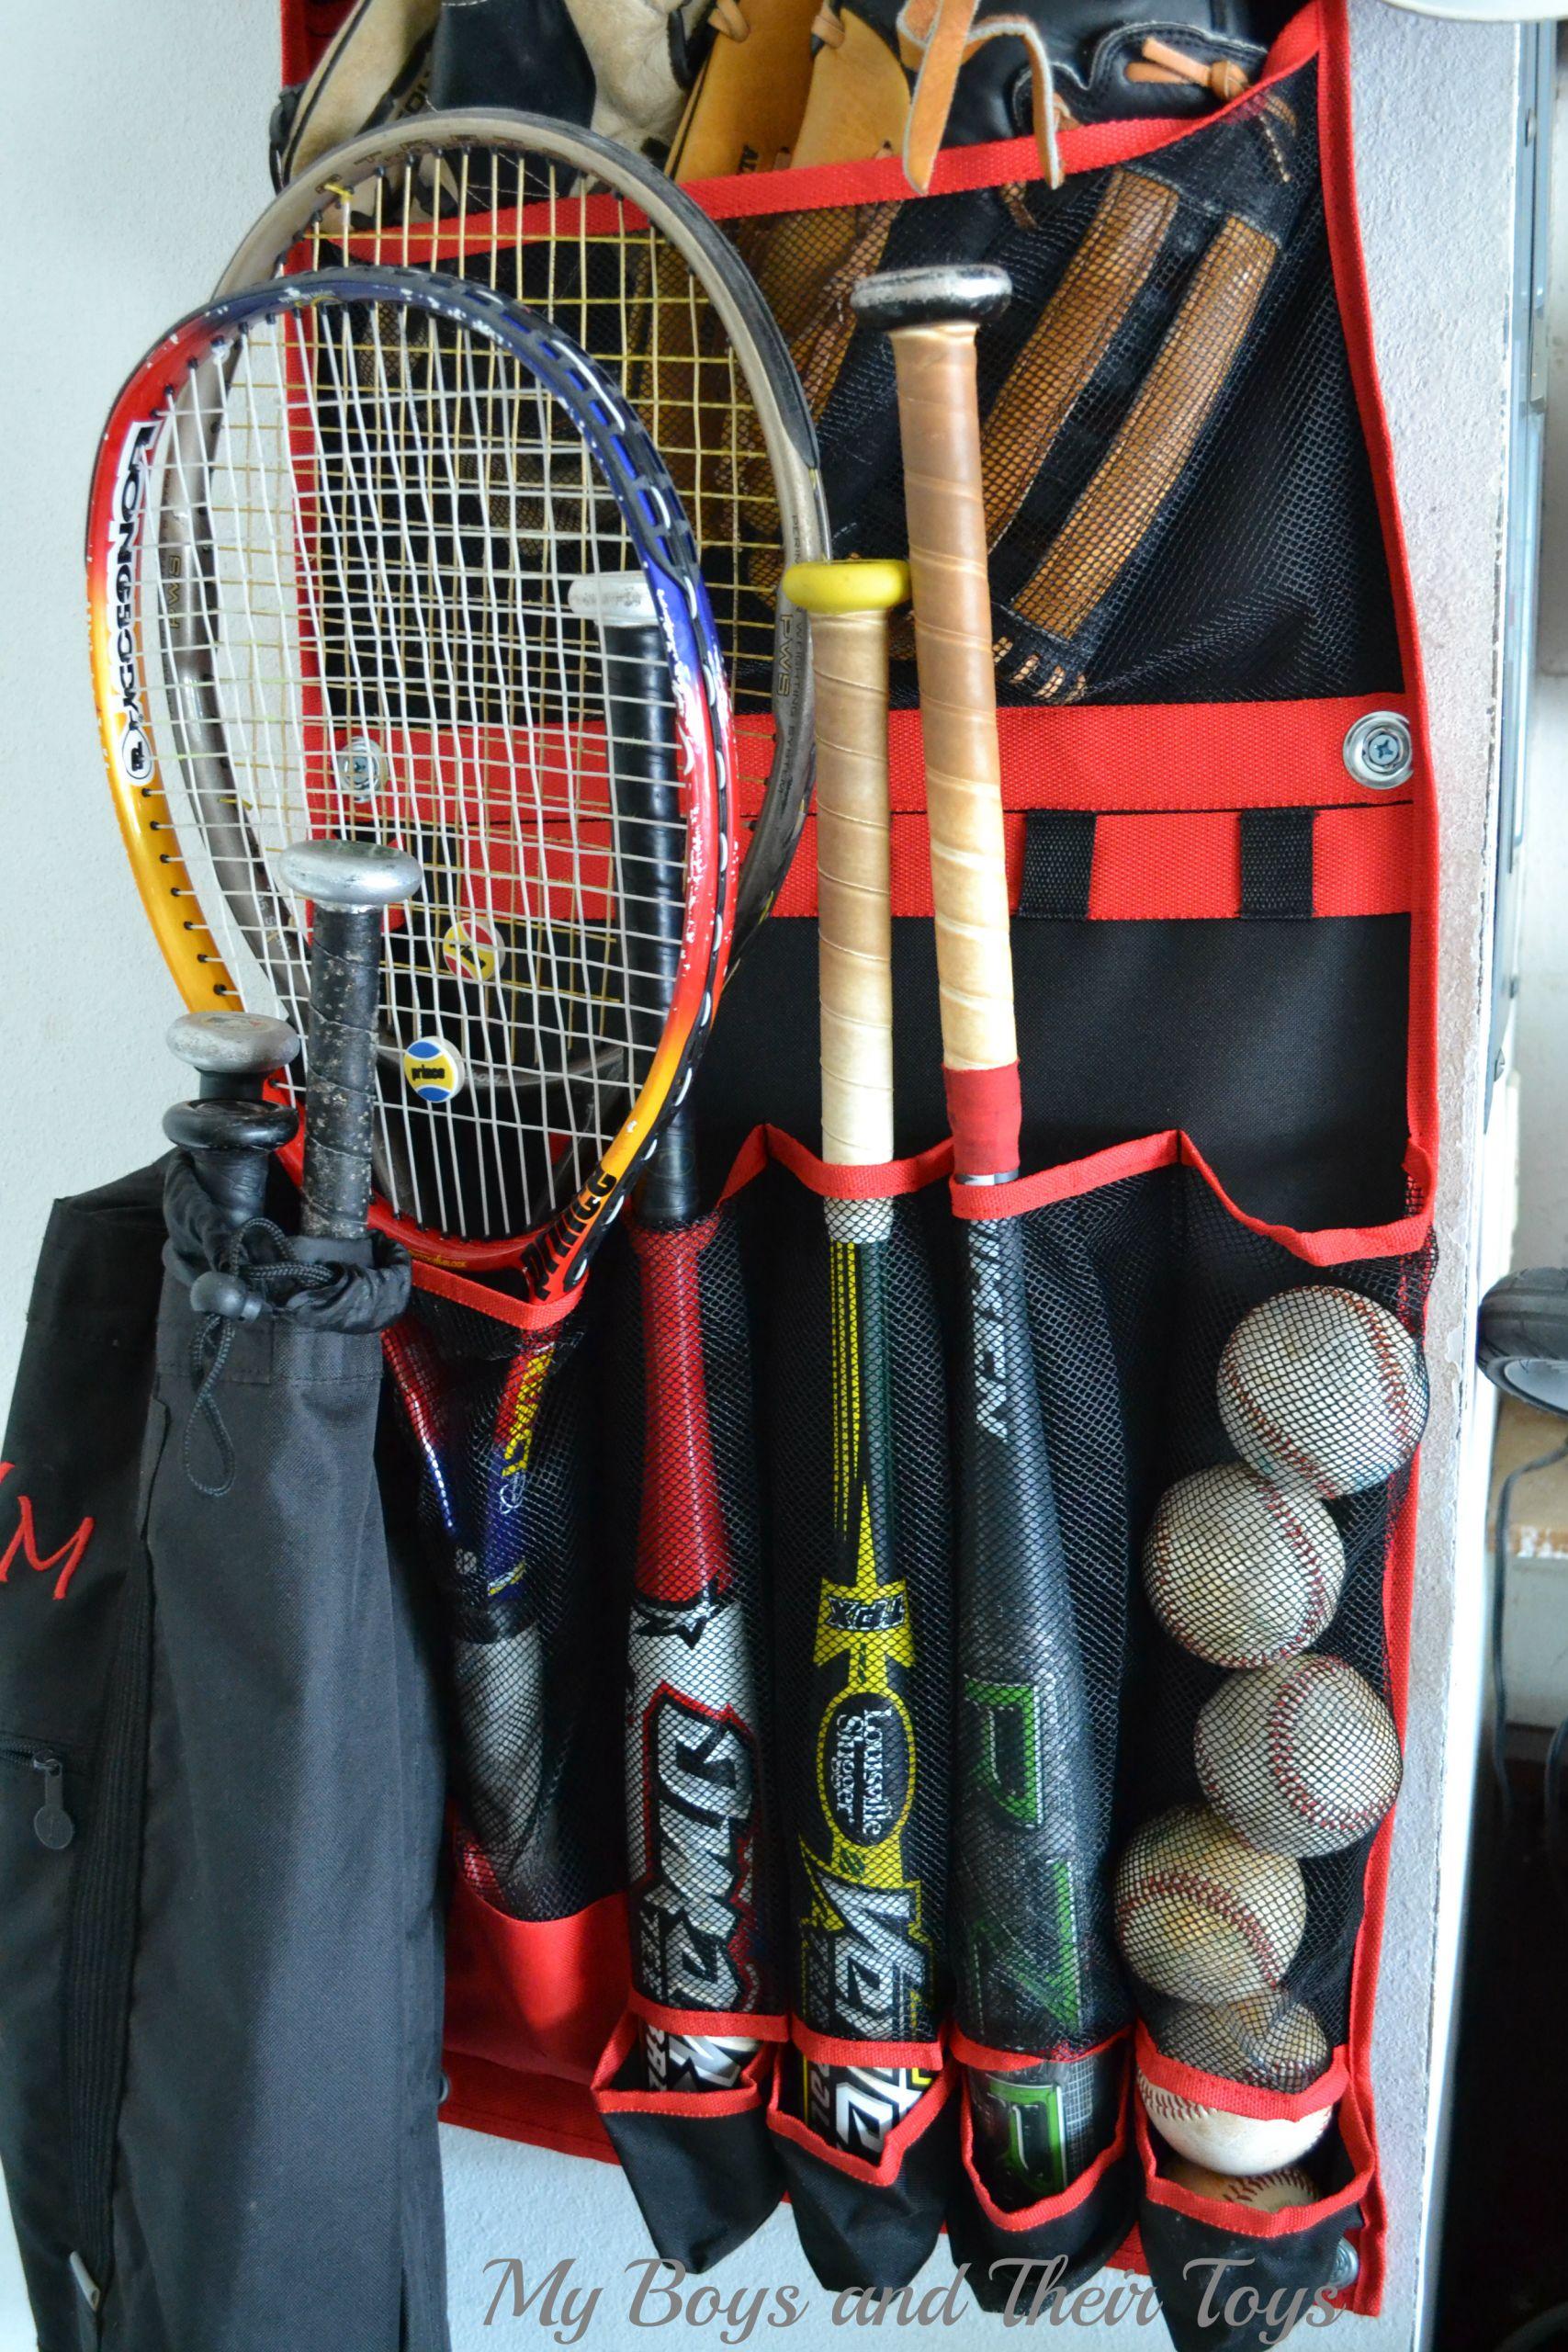 Garage Sports Organizer  Rawlings Vertical Sports Organizer Review & Sponsored Giveaway